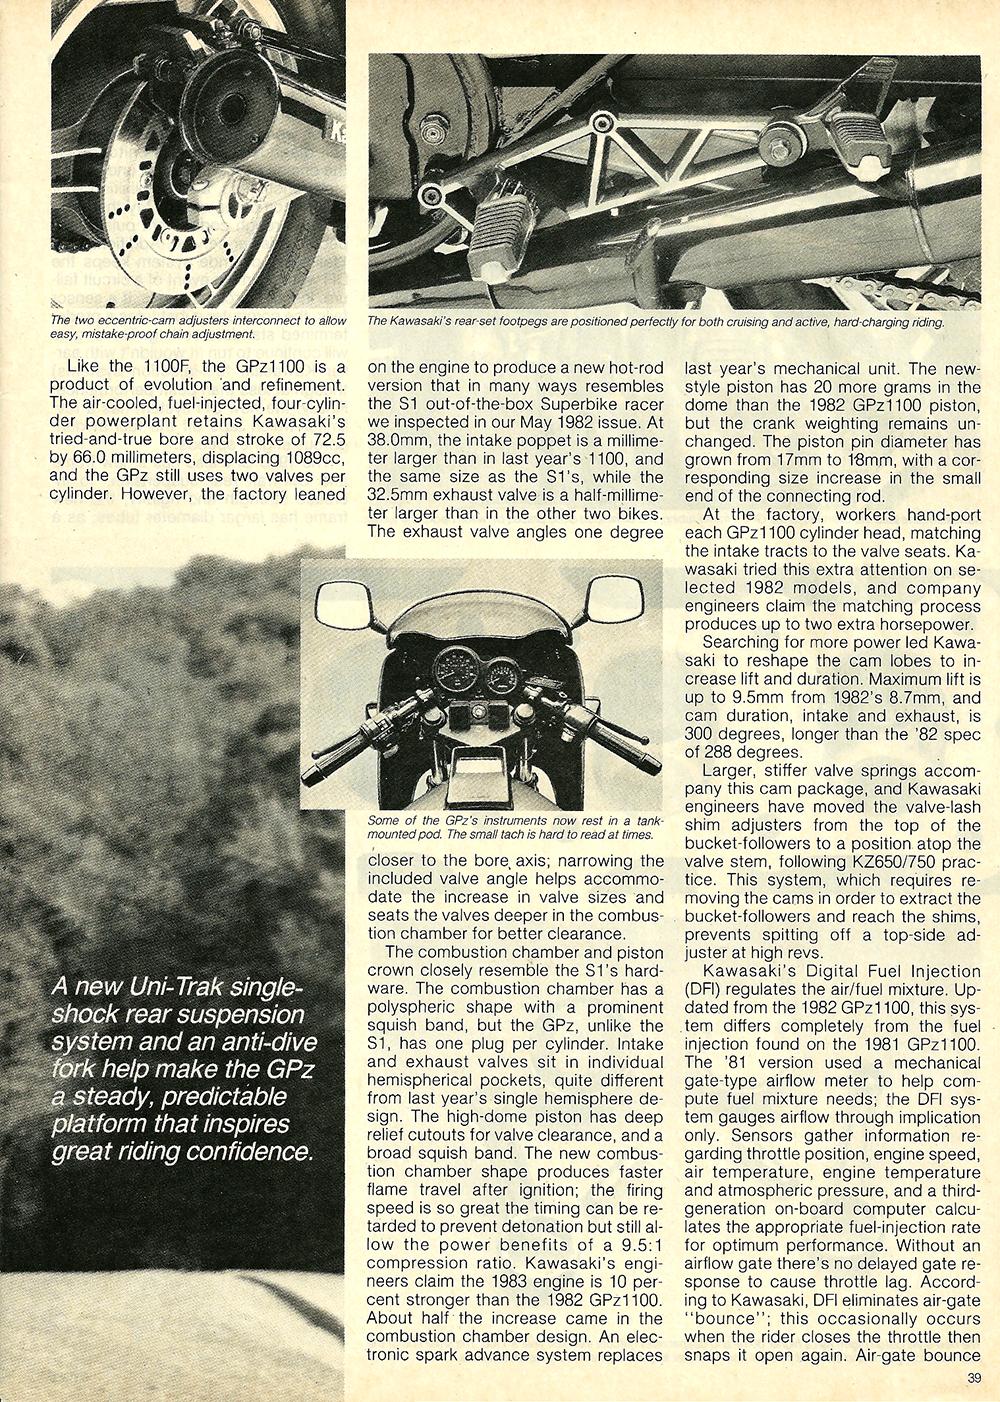 1983 Kawasaki GPz1100 road test 4.jpg